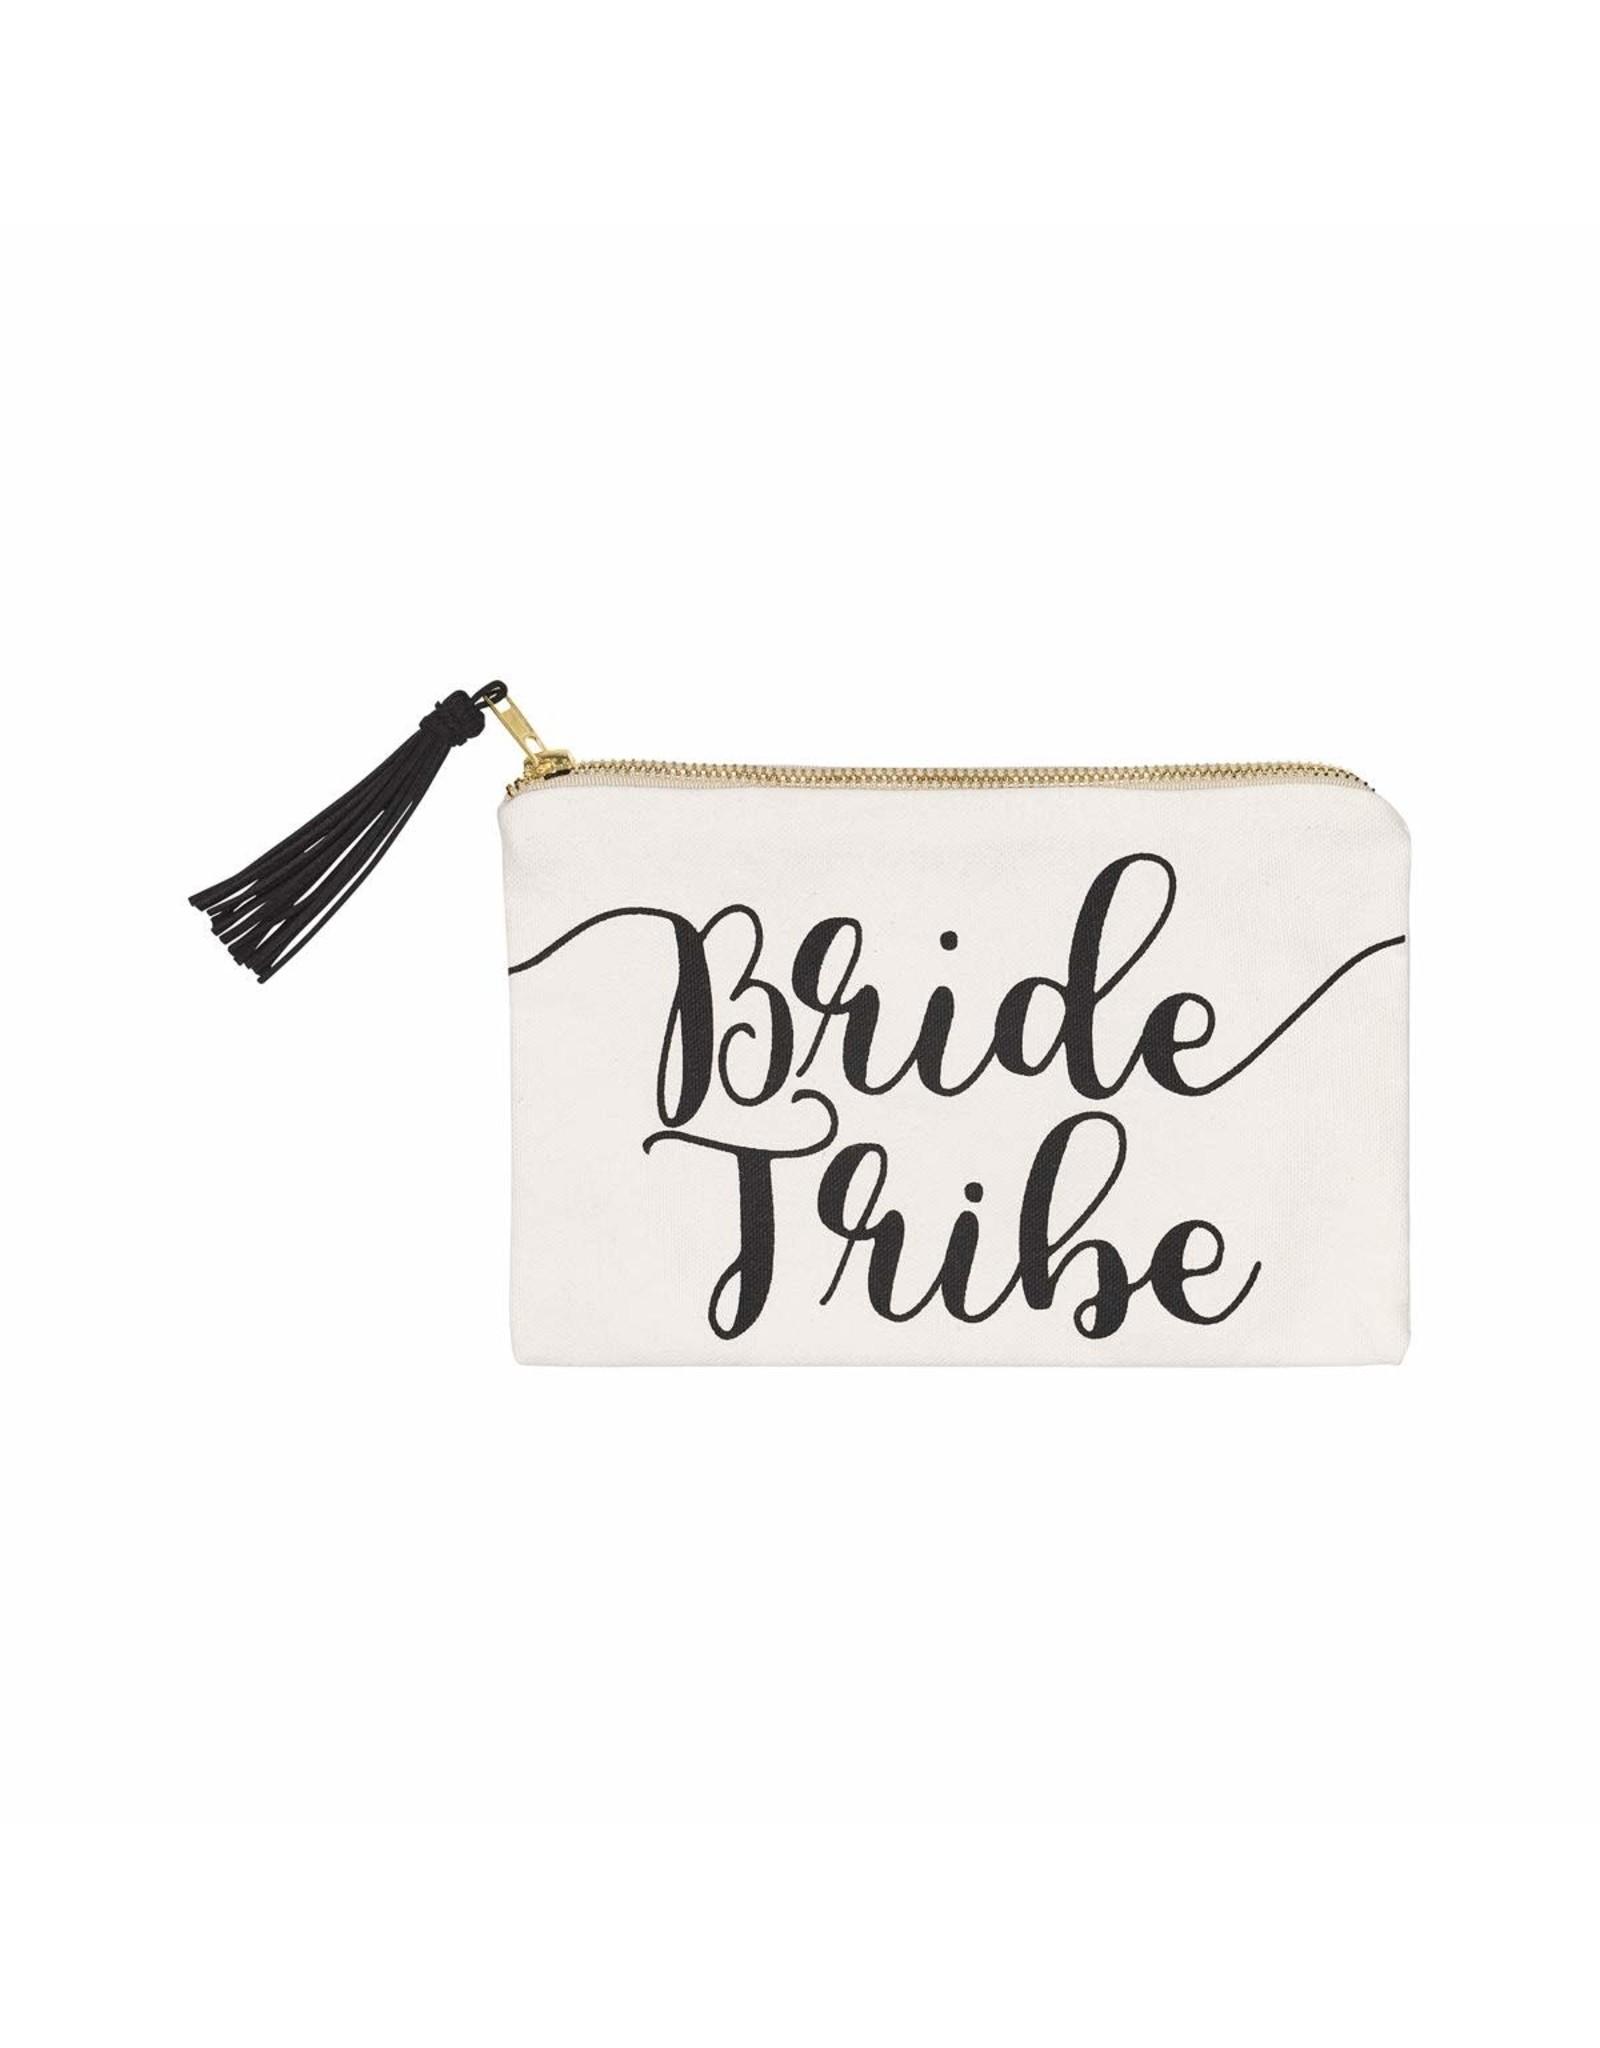 collins Bride Tribe Cosmetic Bag